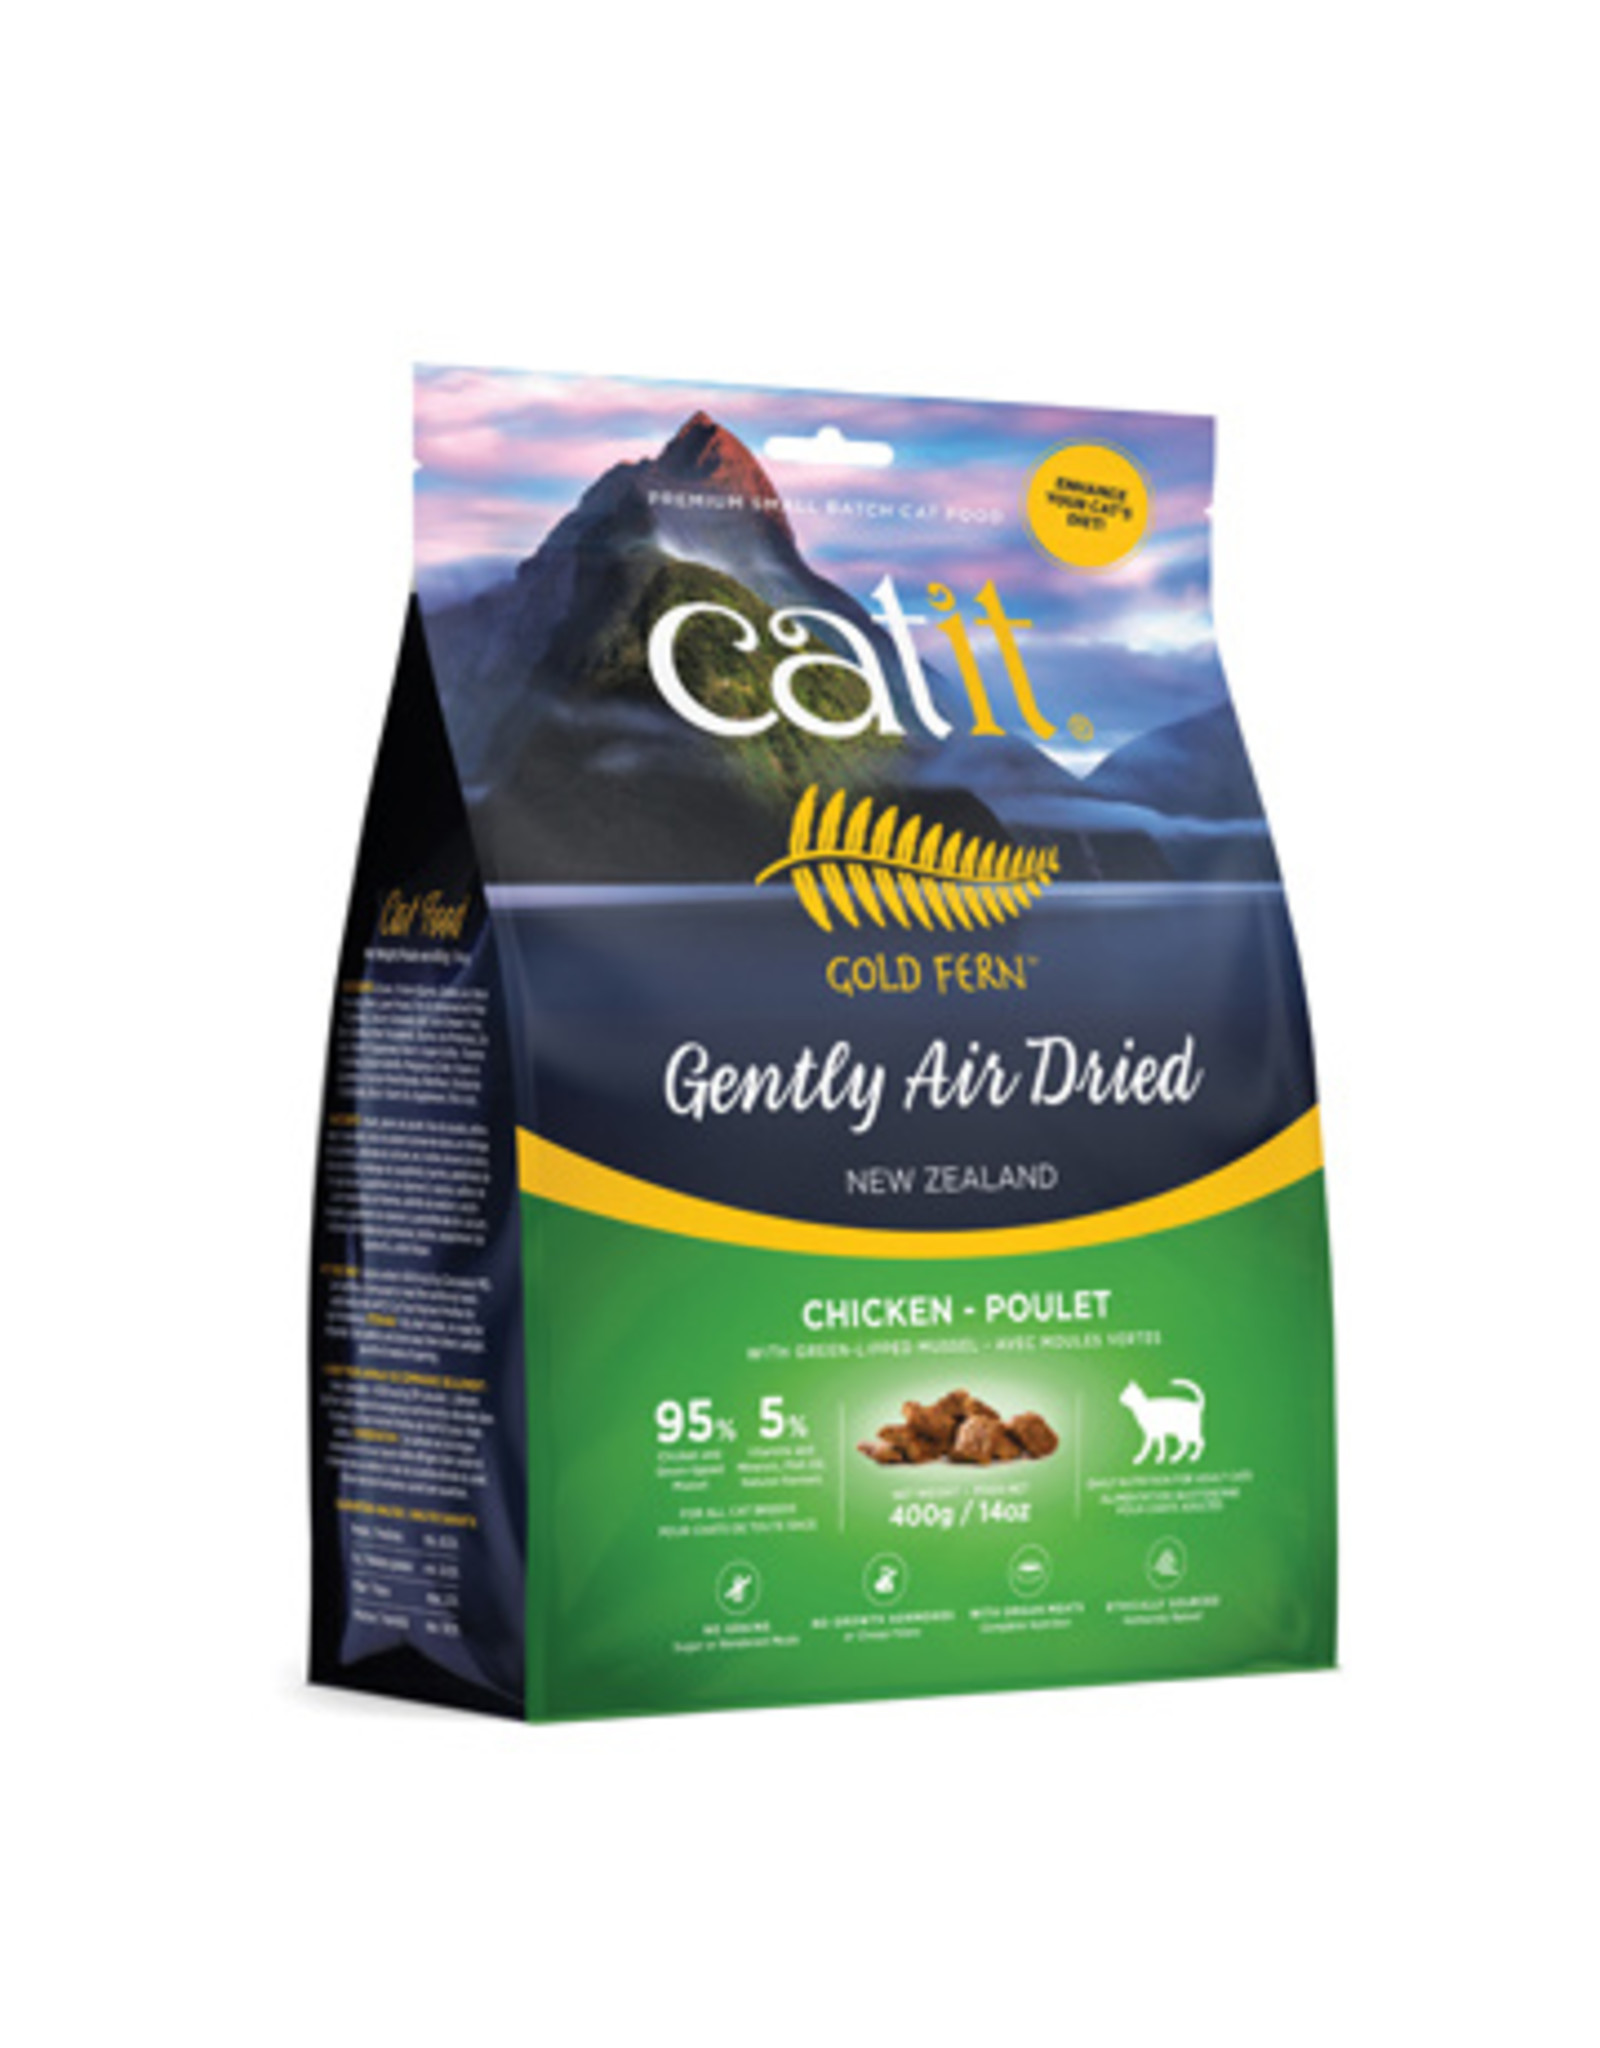 CA - Catit Catit Gold Fern Air Dried Food Chicken